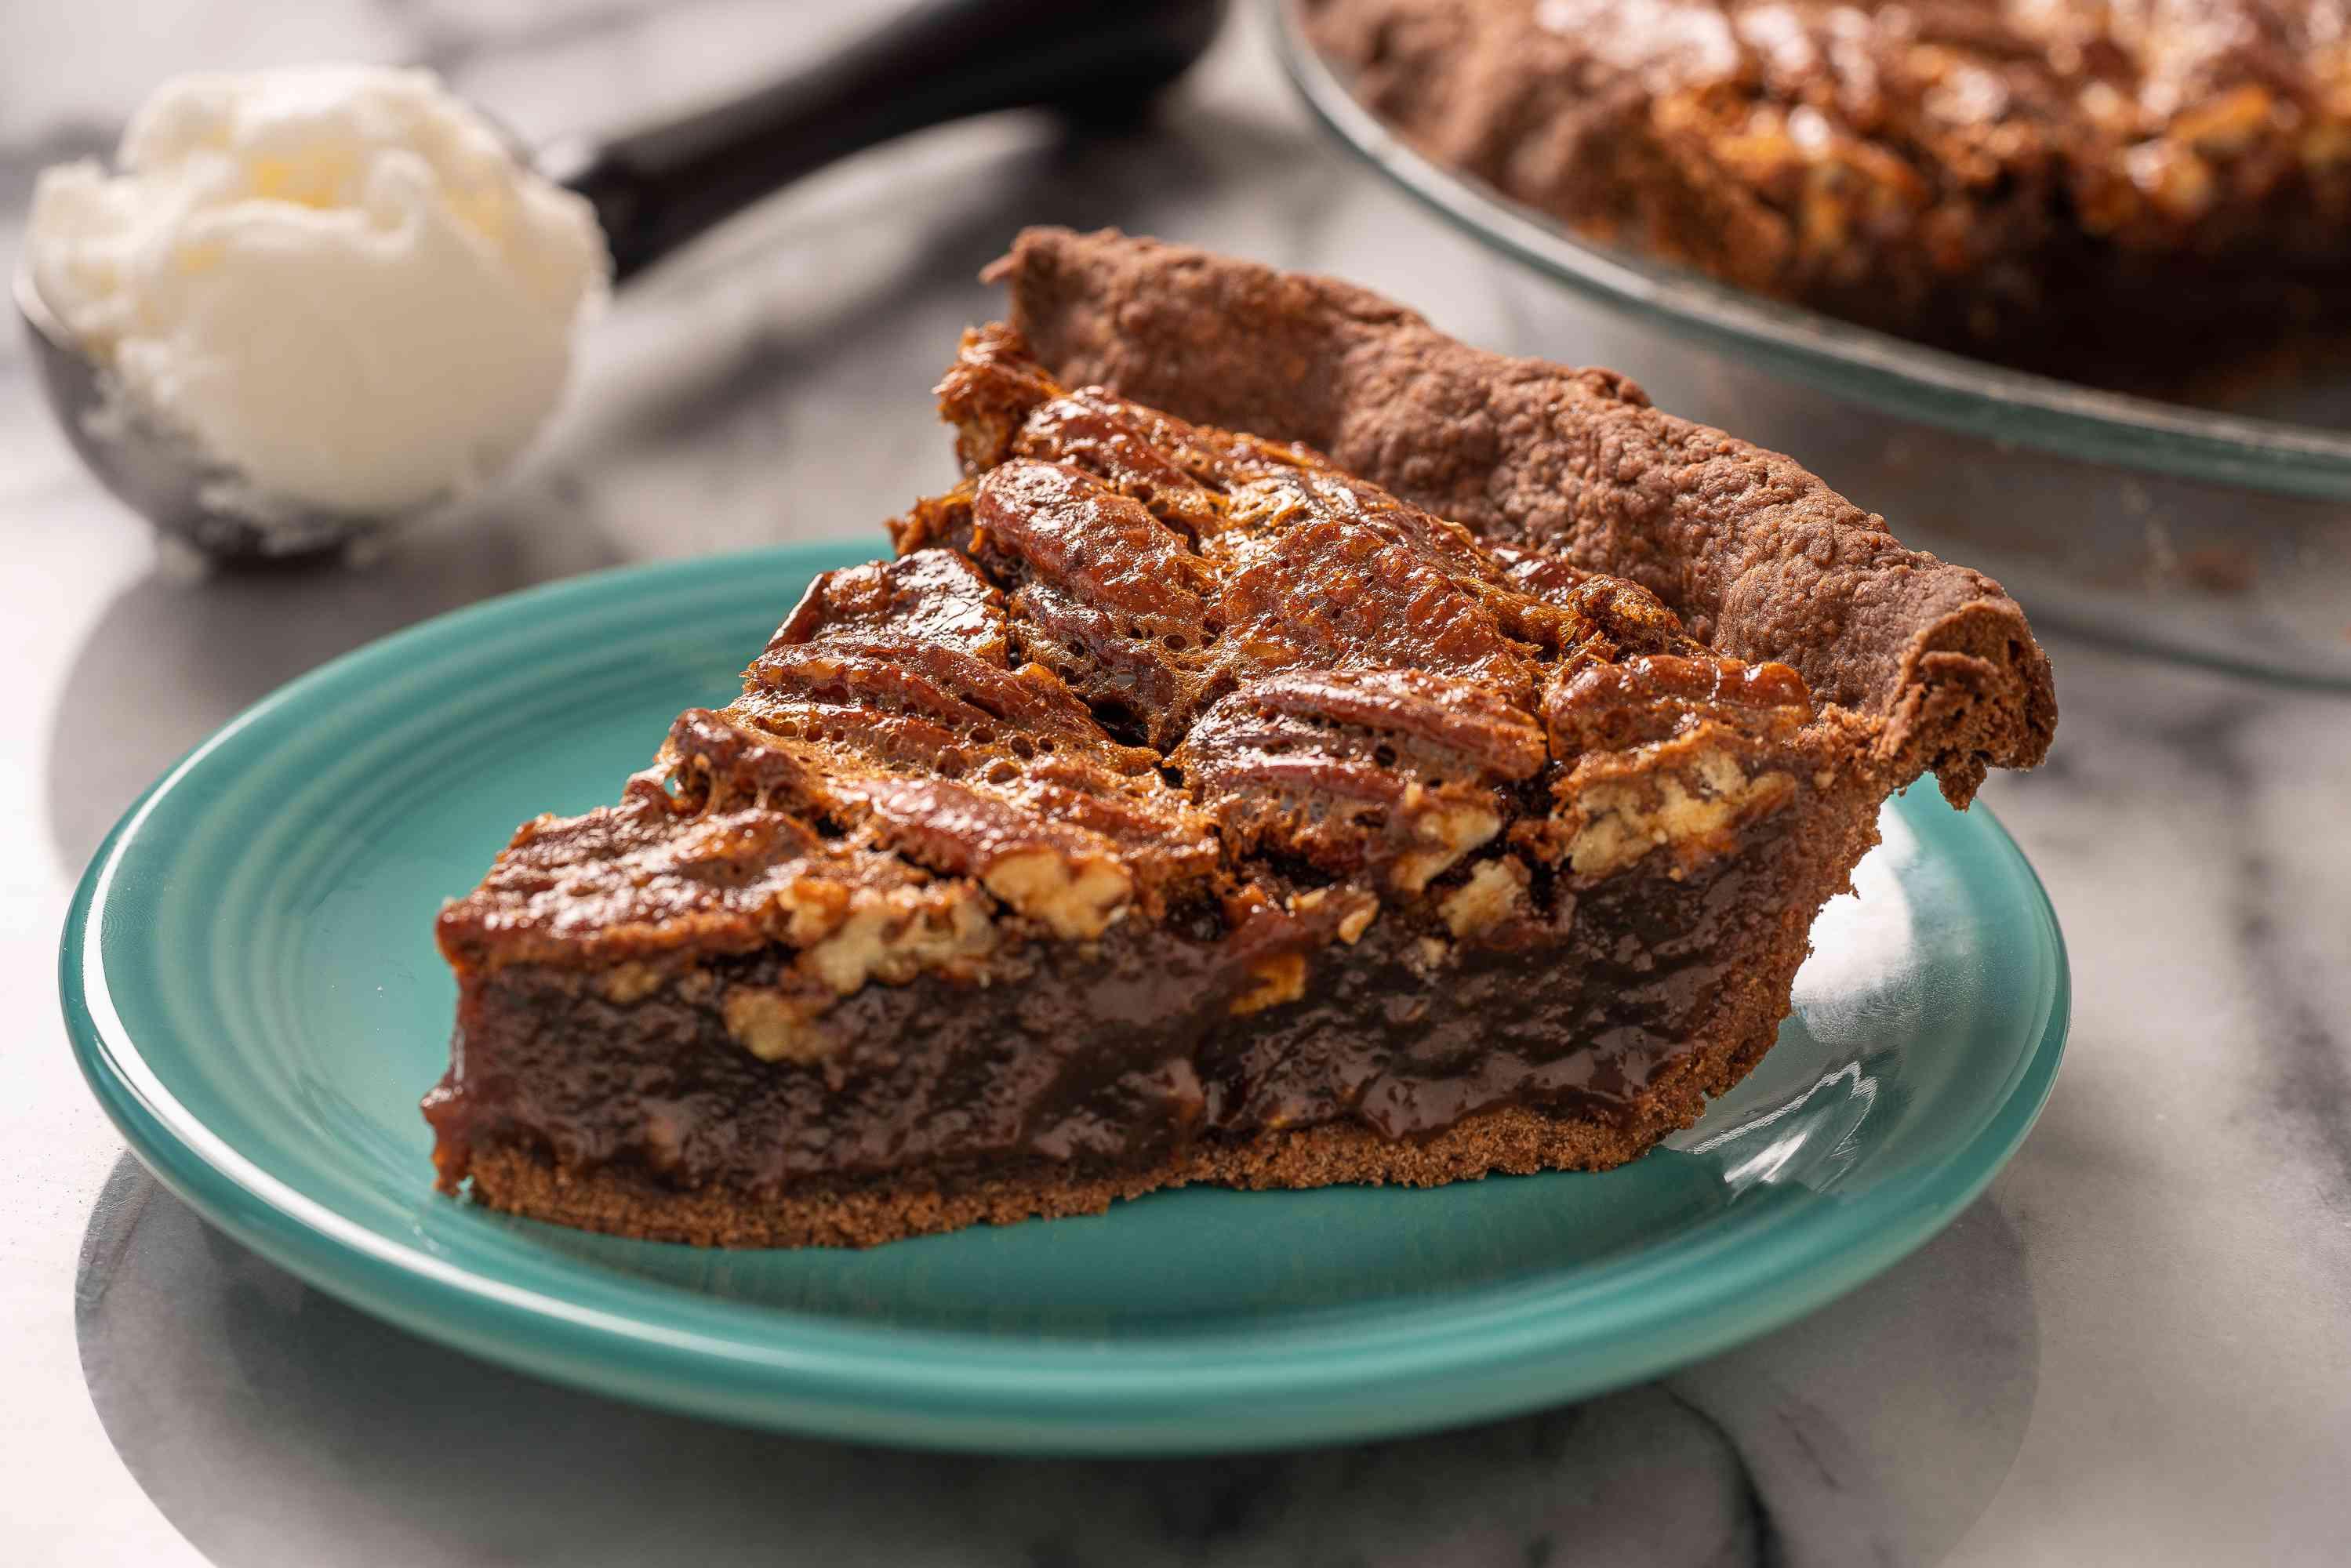 Serving of chocolate pecan pie